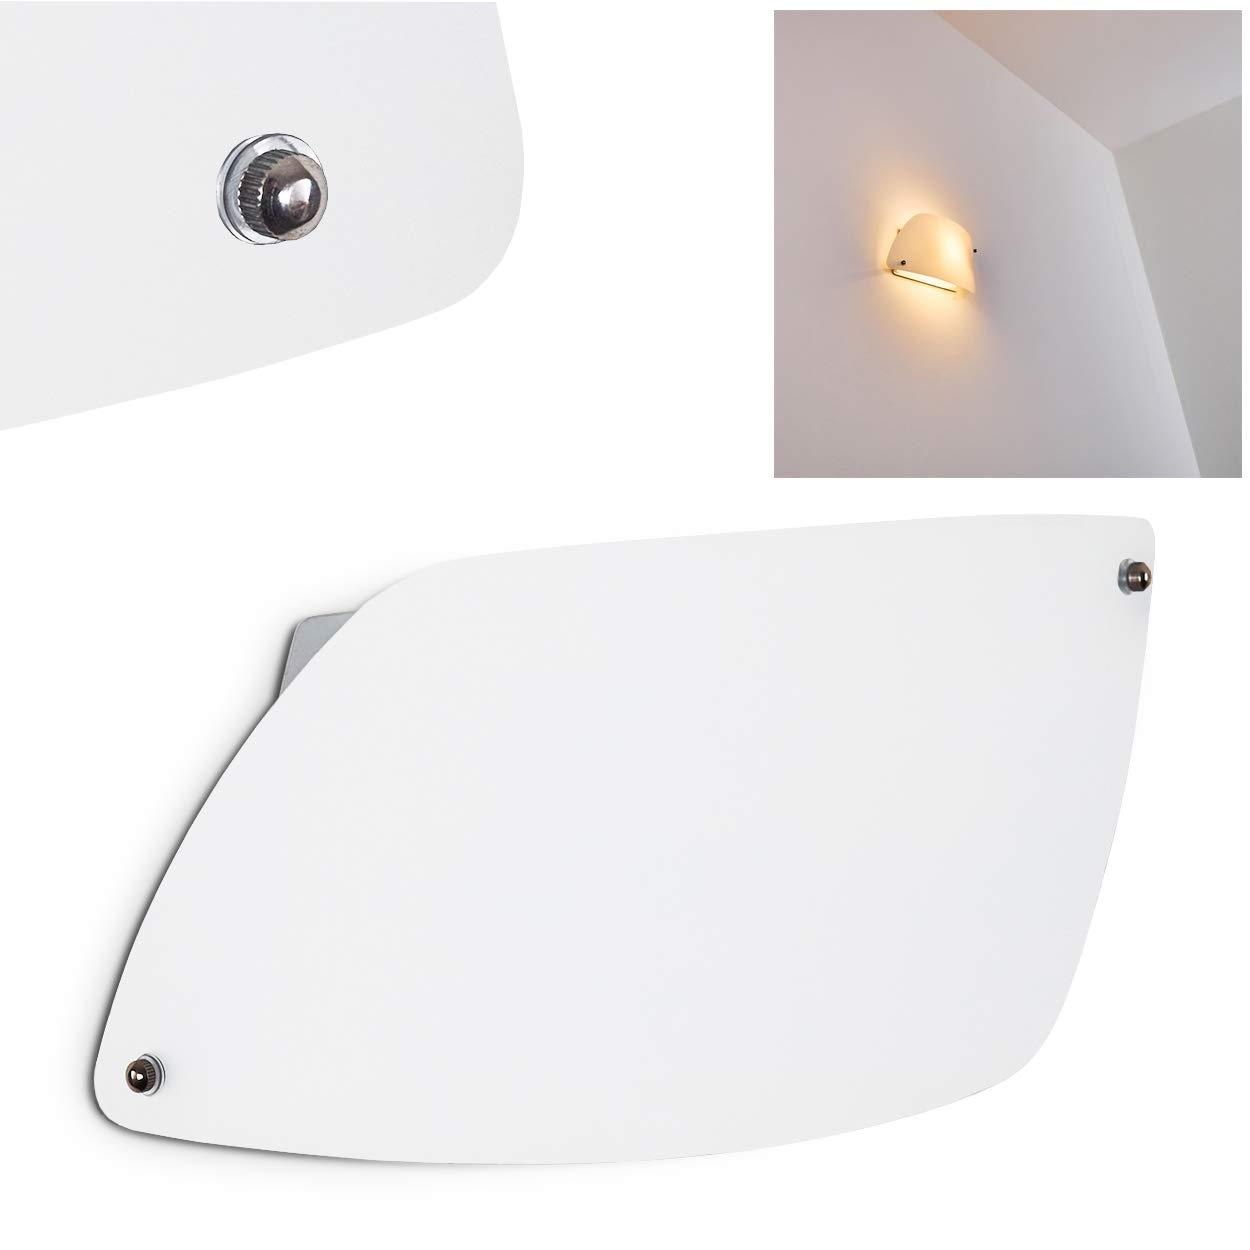 Aplique Anzio de vidrio blanco - Lá mpara moderna para saló n - dormitorio - pasillo Hofstein